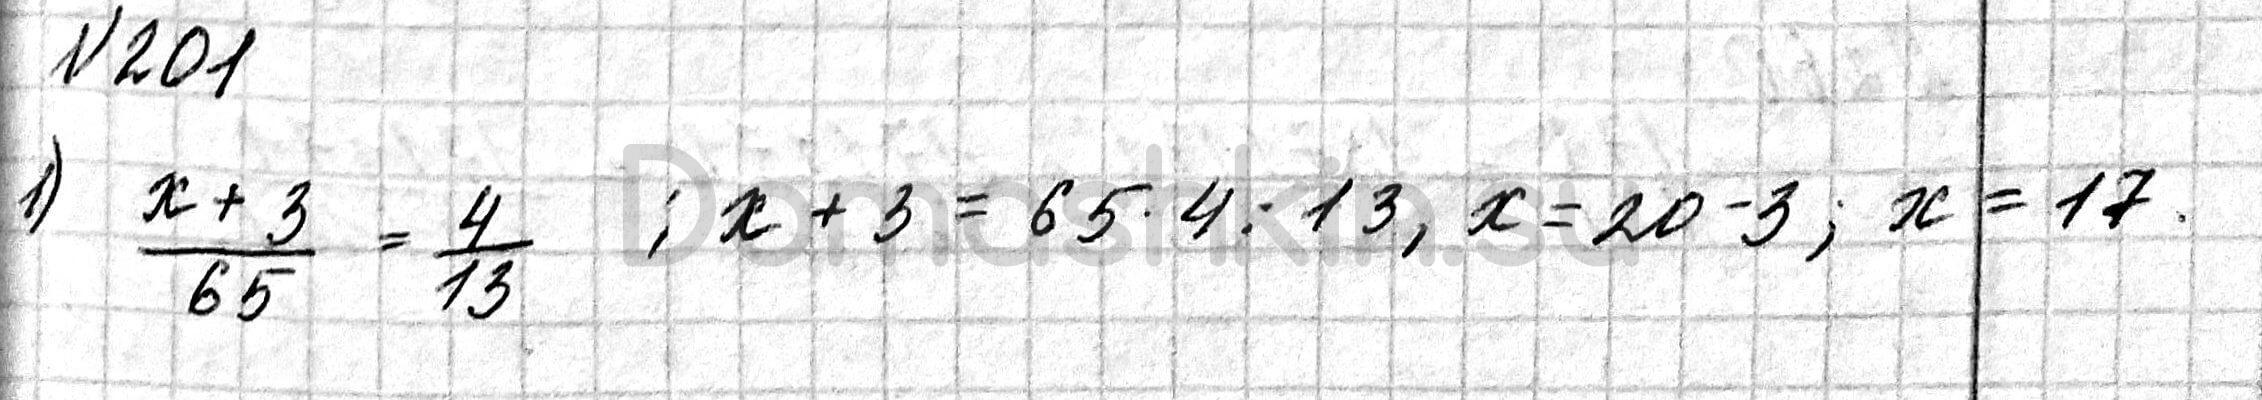 Математика 6 класс учебник Мерзляк номер 201 решение